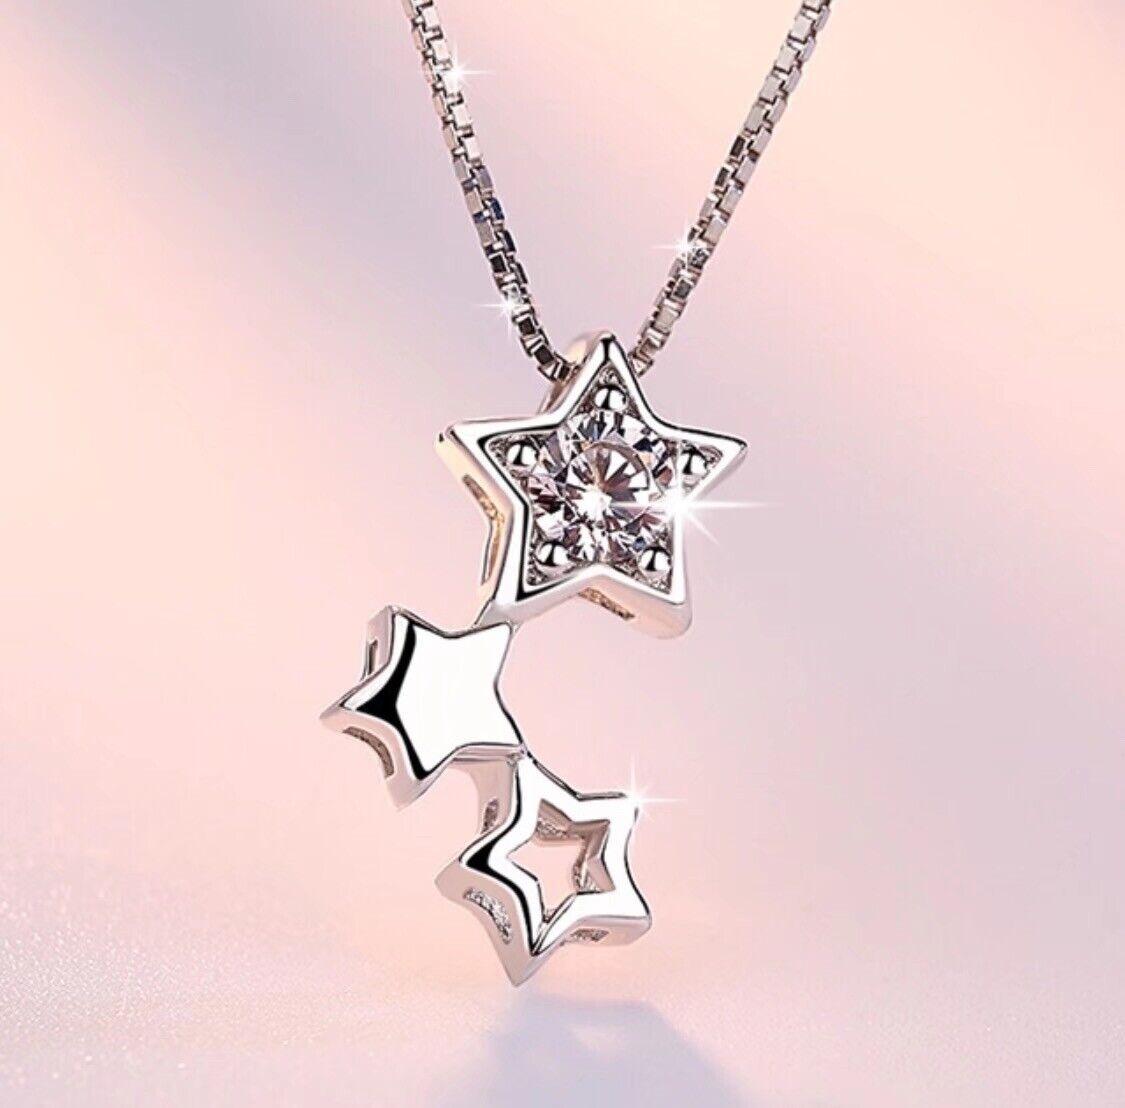 Jewellery -  925 Sterling Silver Multi Star Linked Pendant Chain Necklace Women's  Jewellery